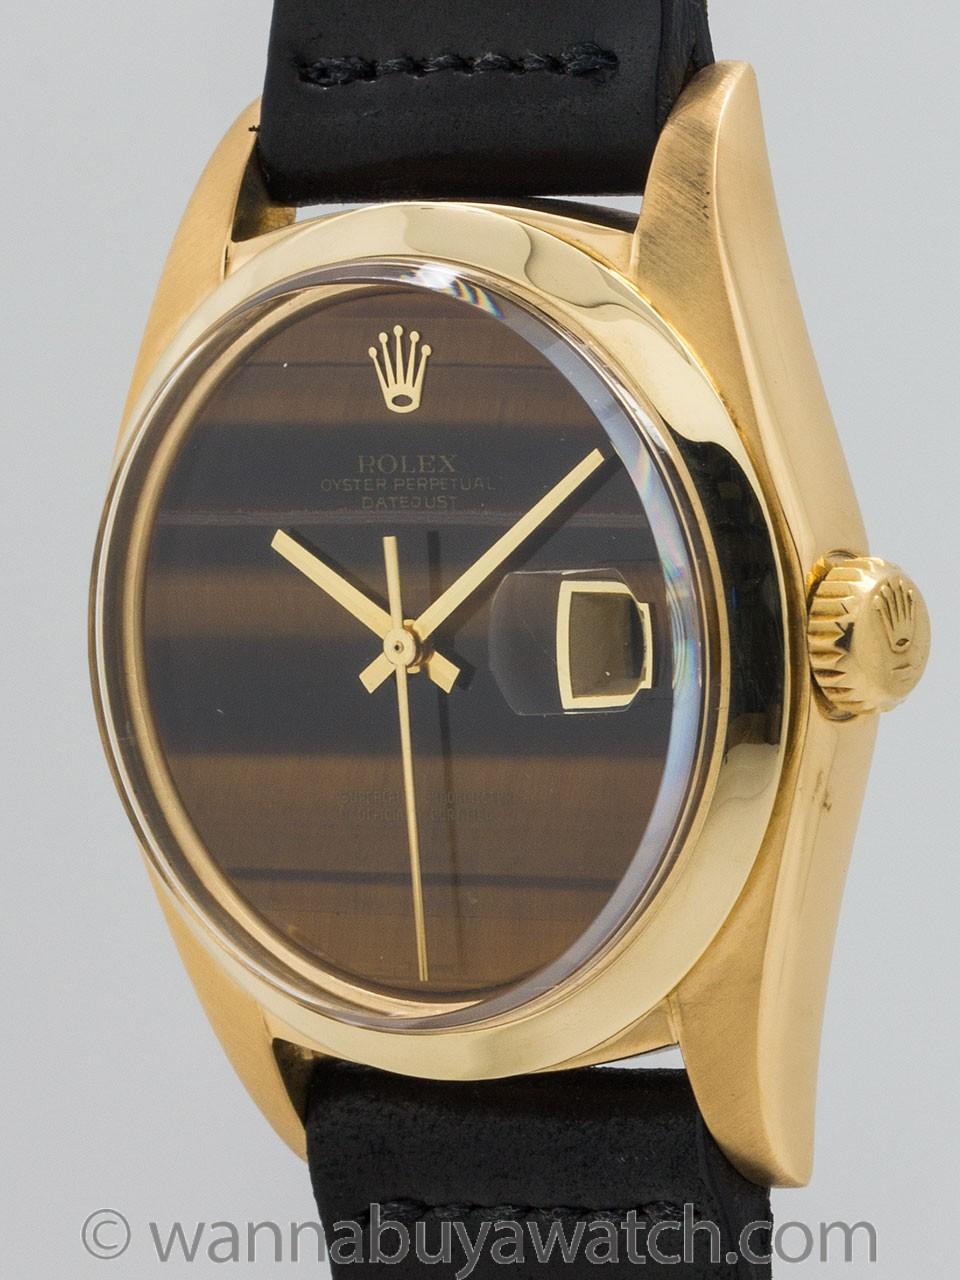 Rolex 18K YG Datejust ref 1601 Tiger's Eye circa 1974